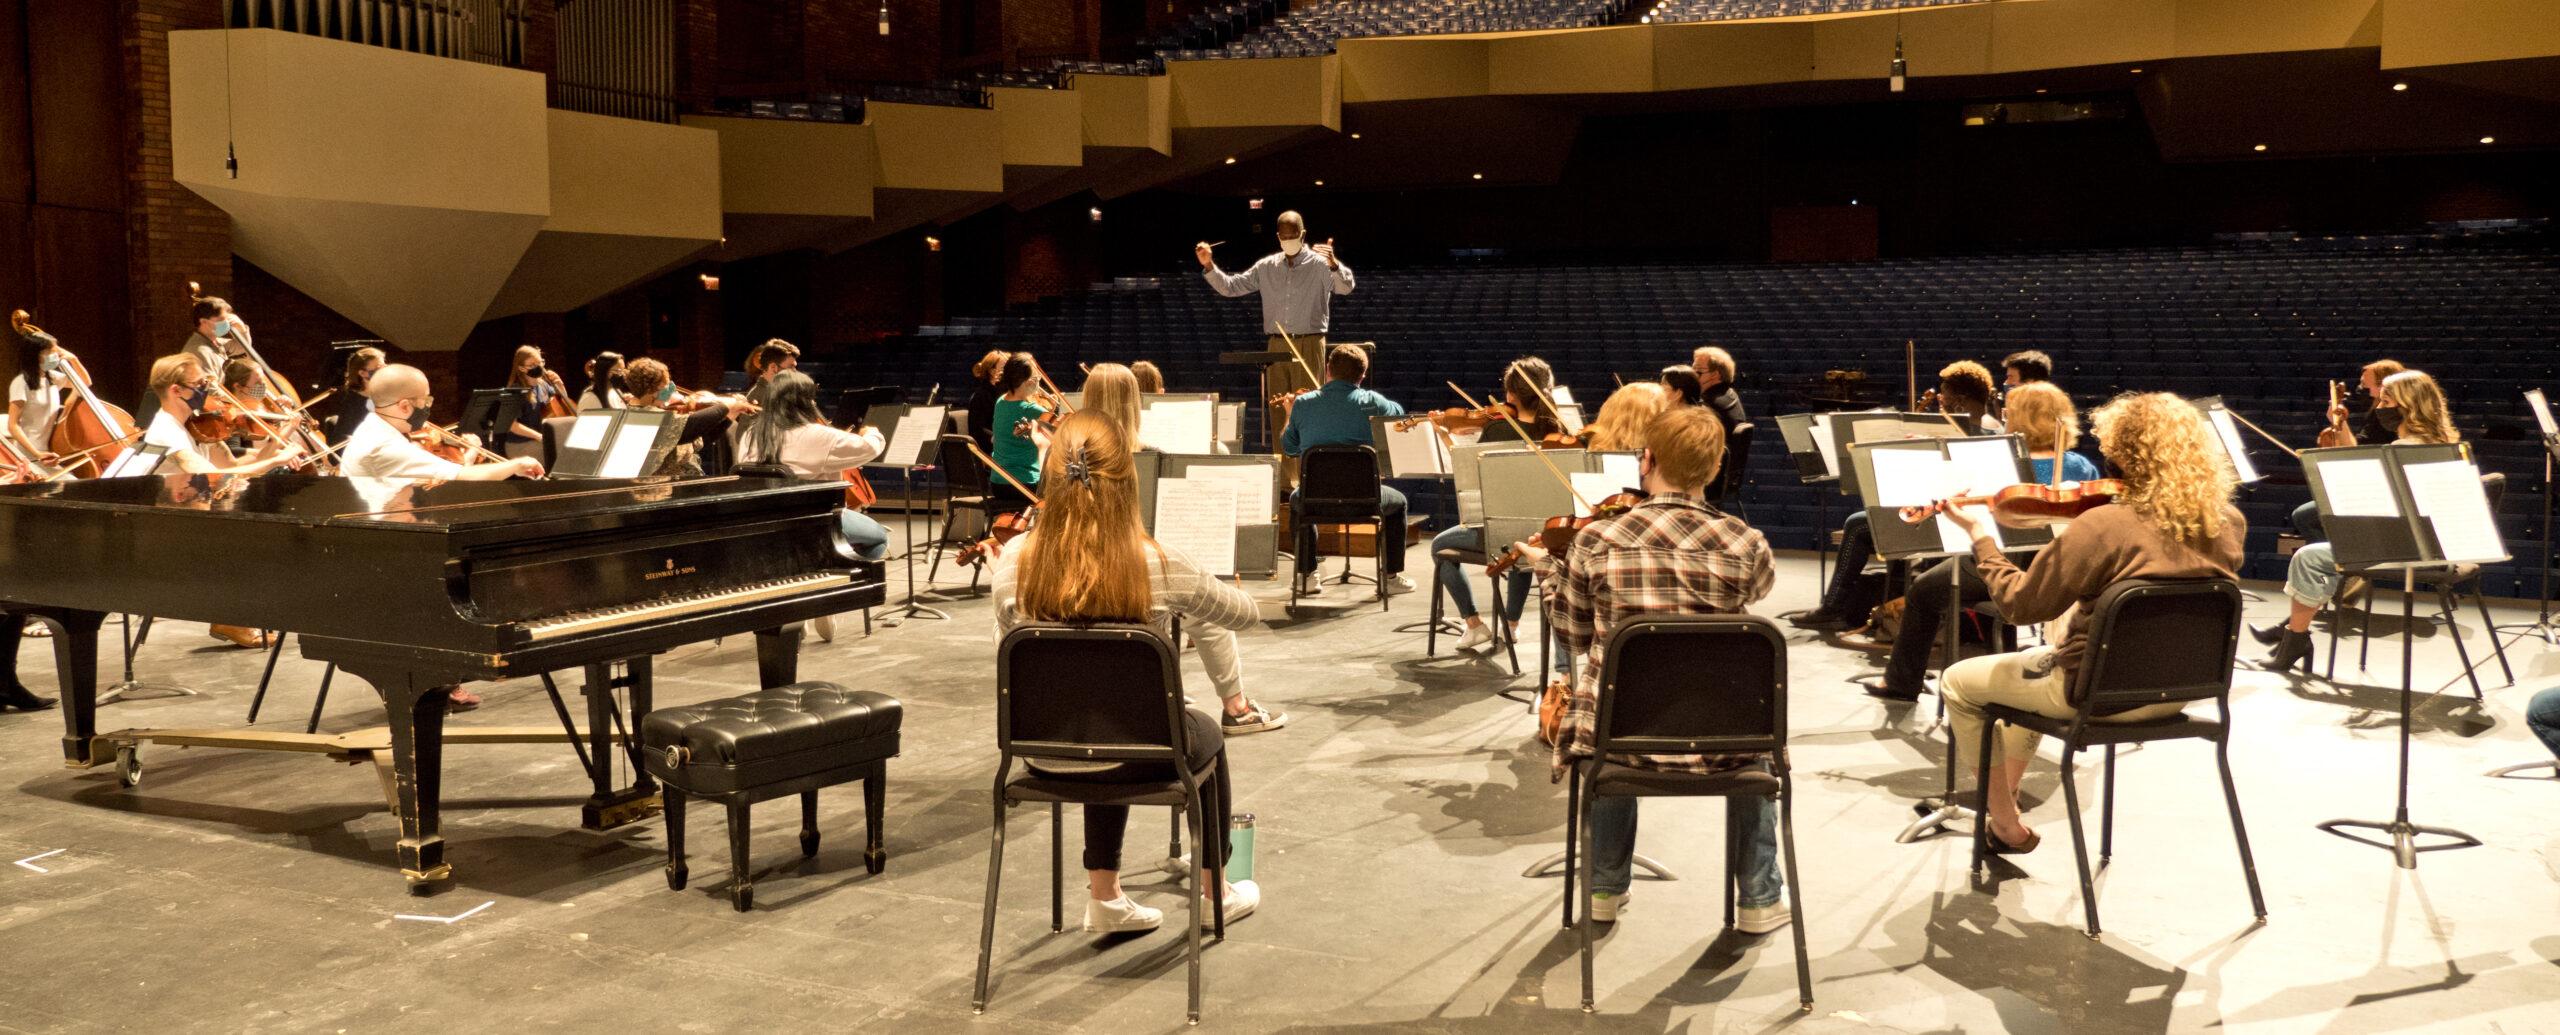 Millikin-Decatur Symphony Orchestra